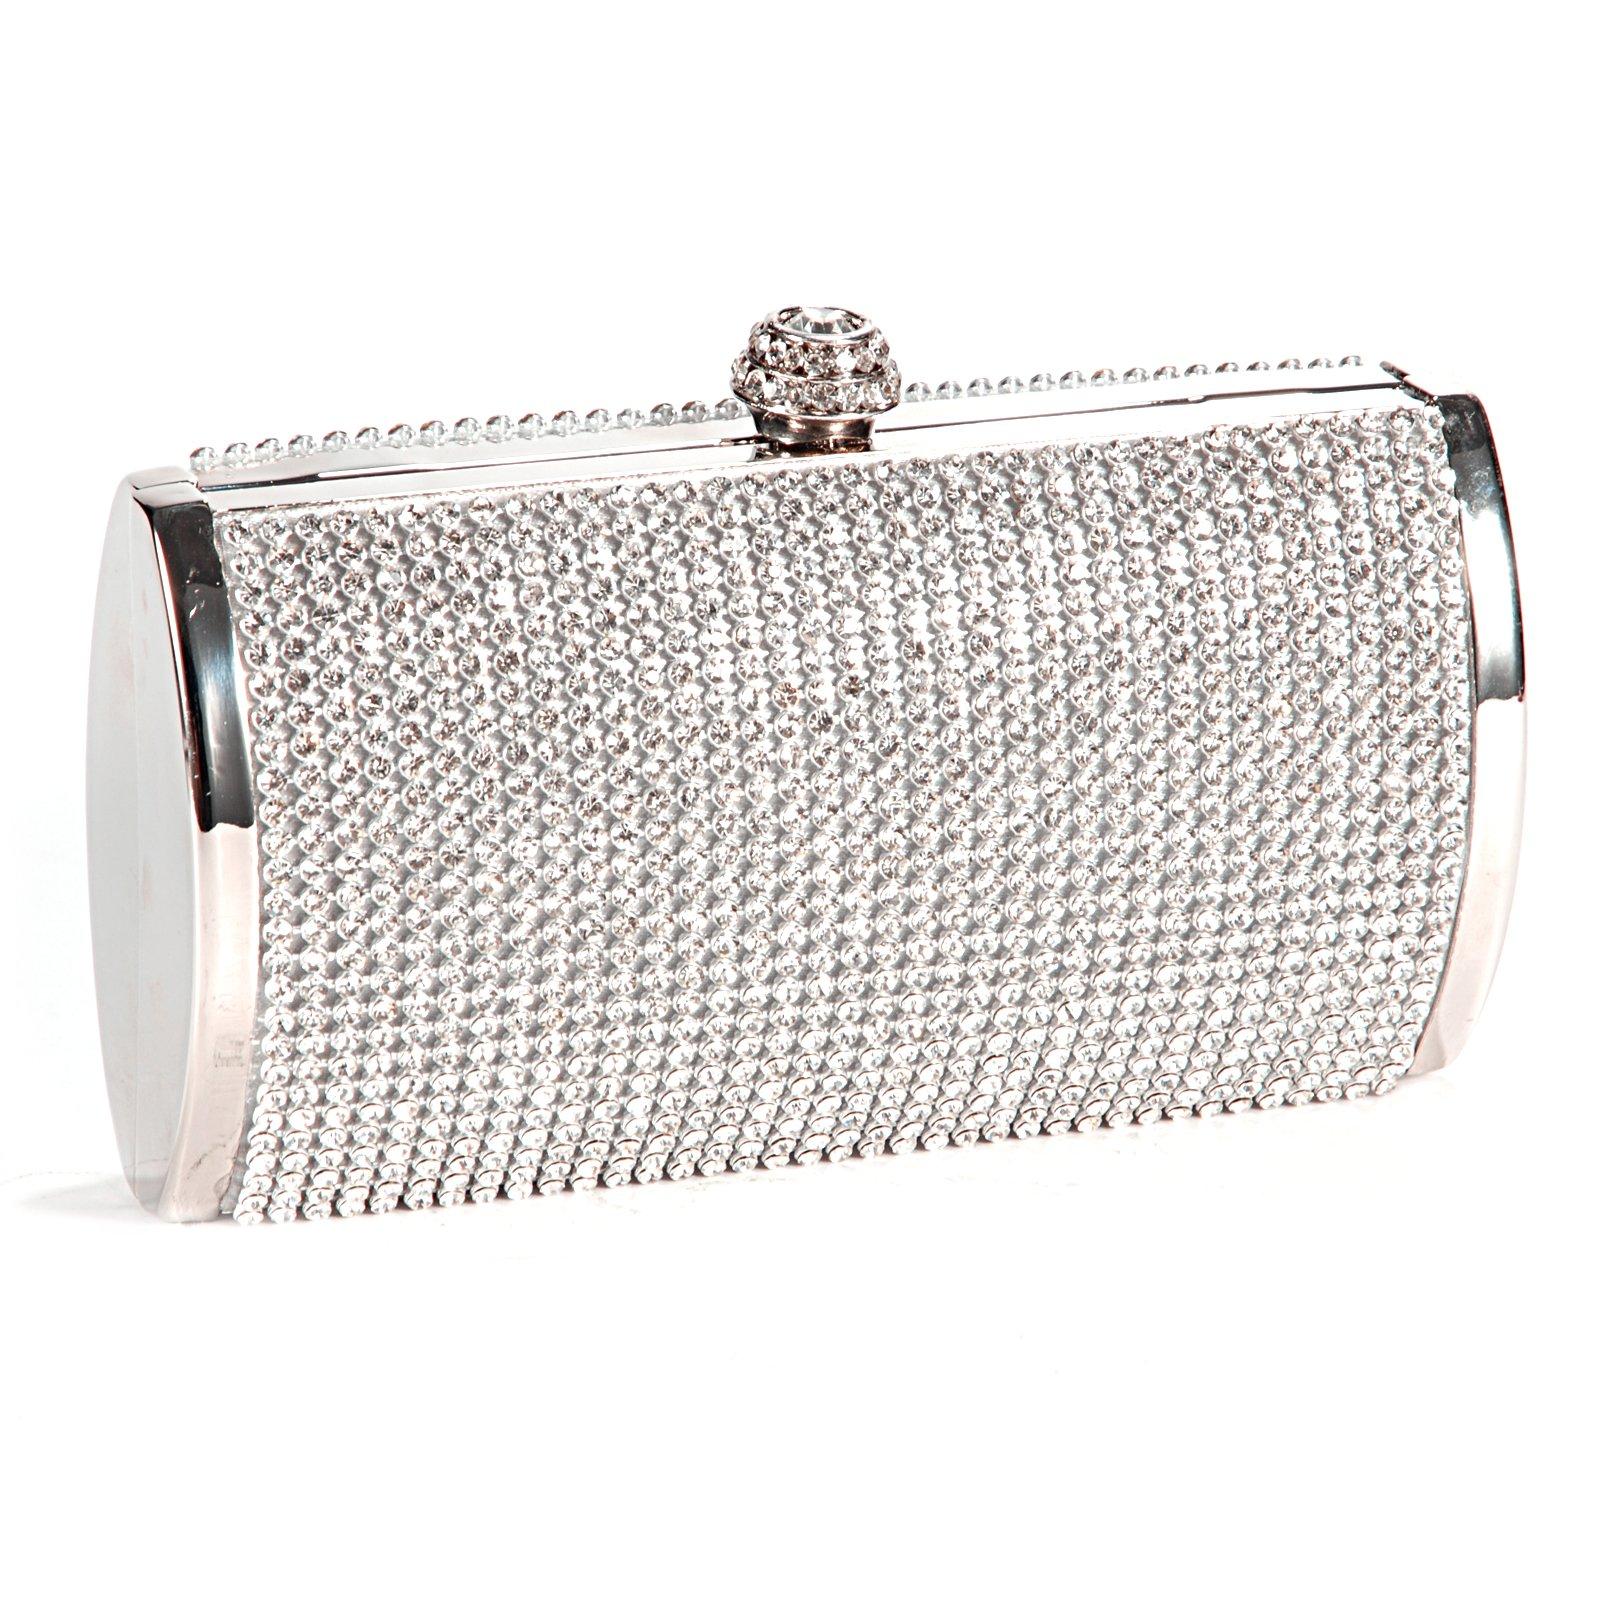 WCS Handbag Pouch Wallet Rigid Metallic Deco Rhinestones For Woman Girl Silvery